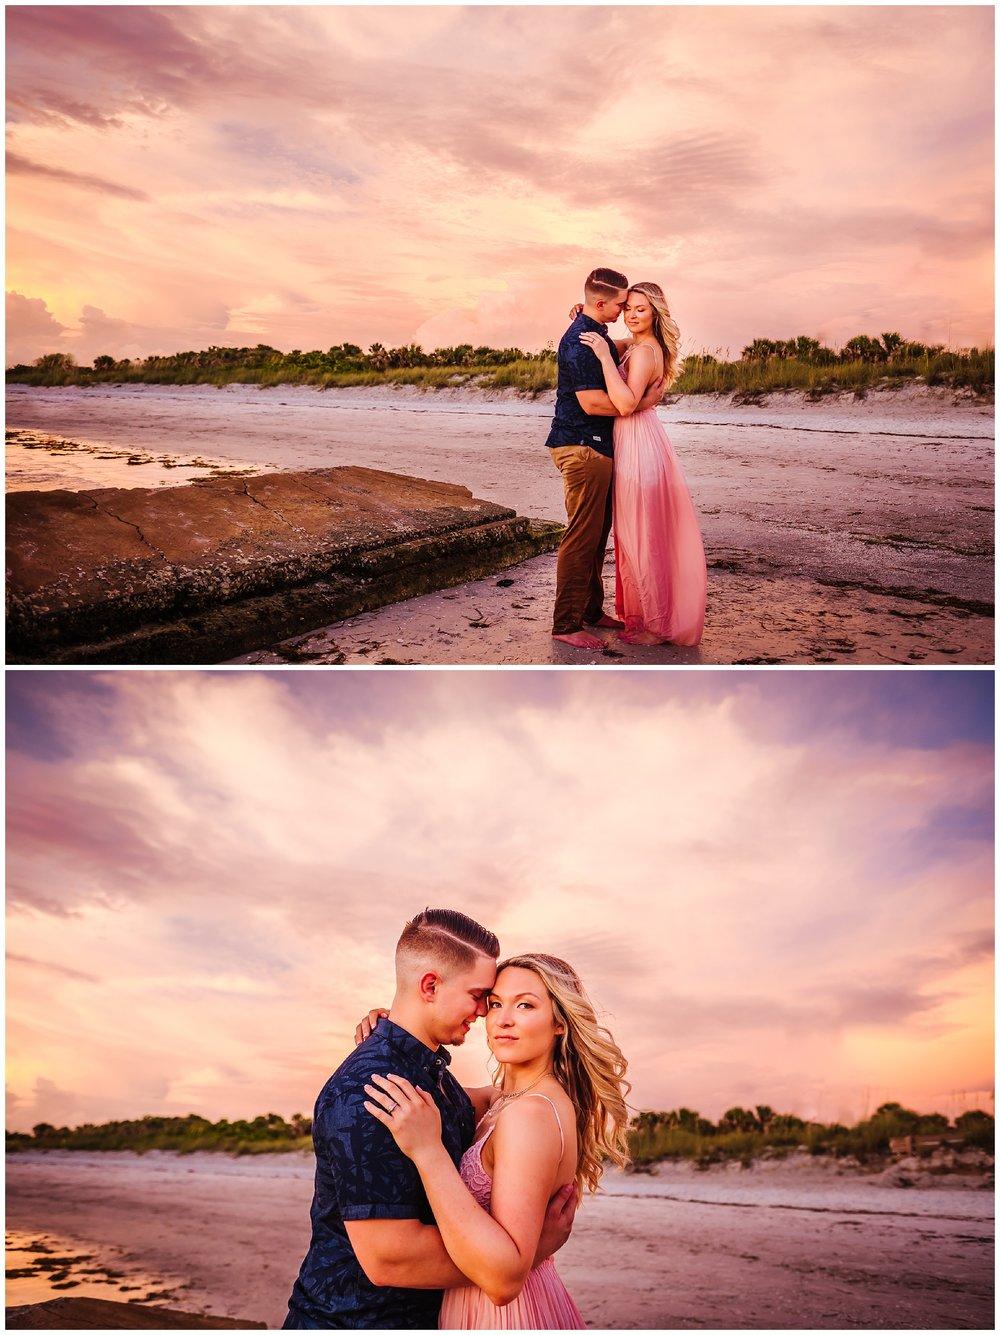 fort-desoto-engagement-photos-florida-beach-sunset_0249.jpg